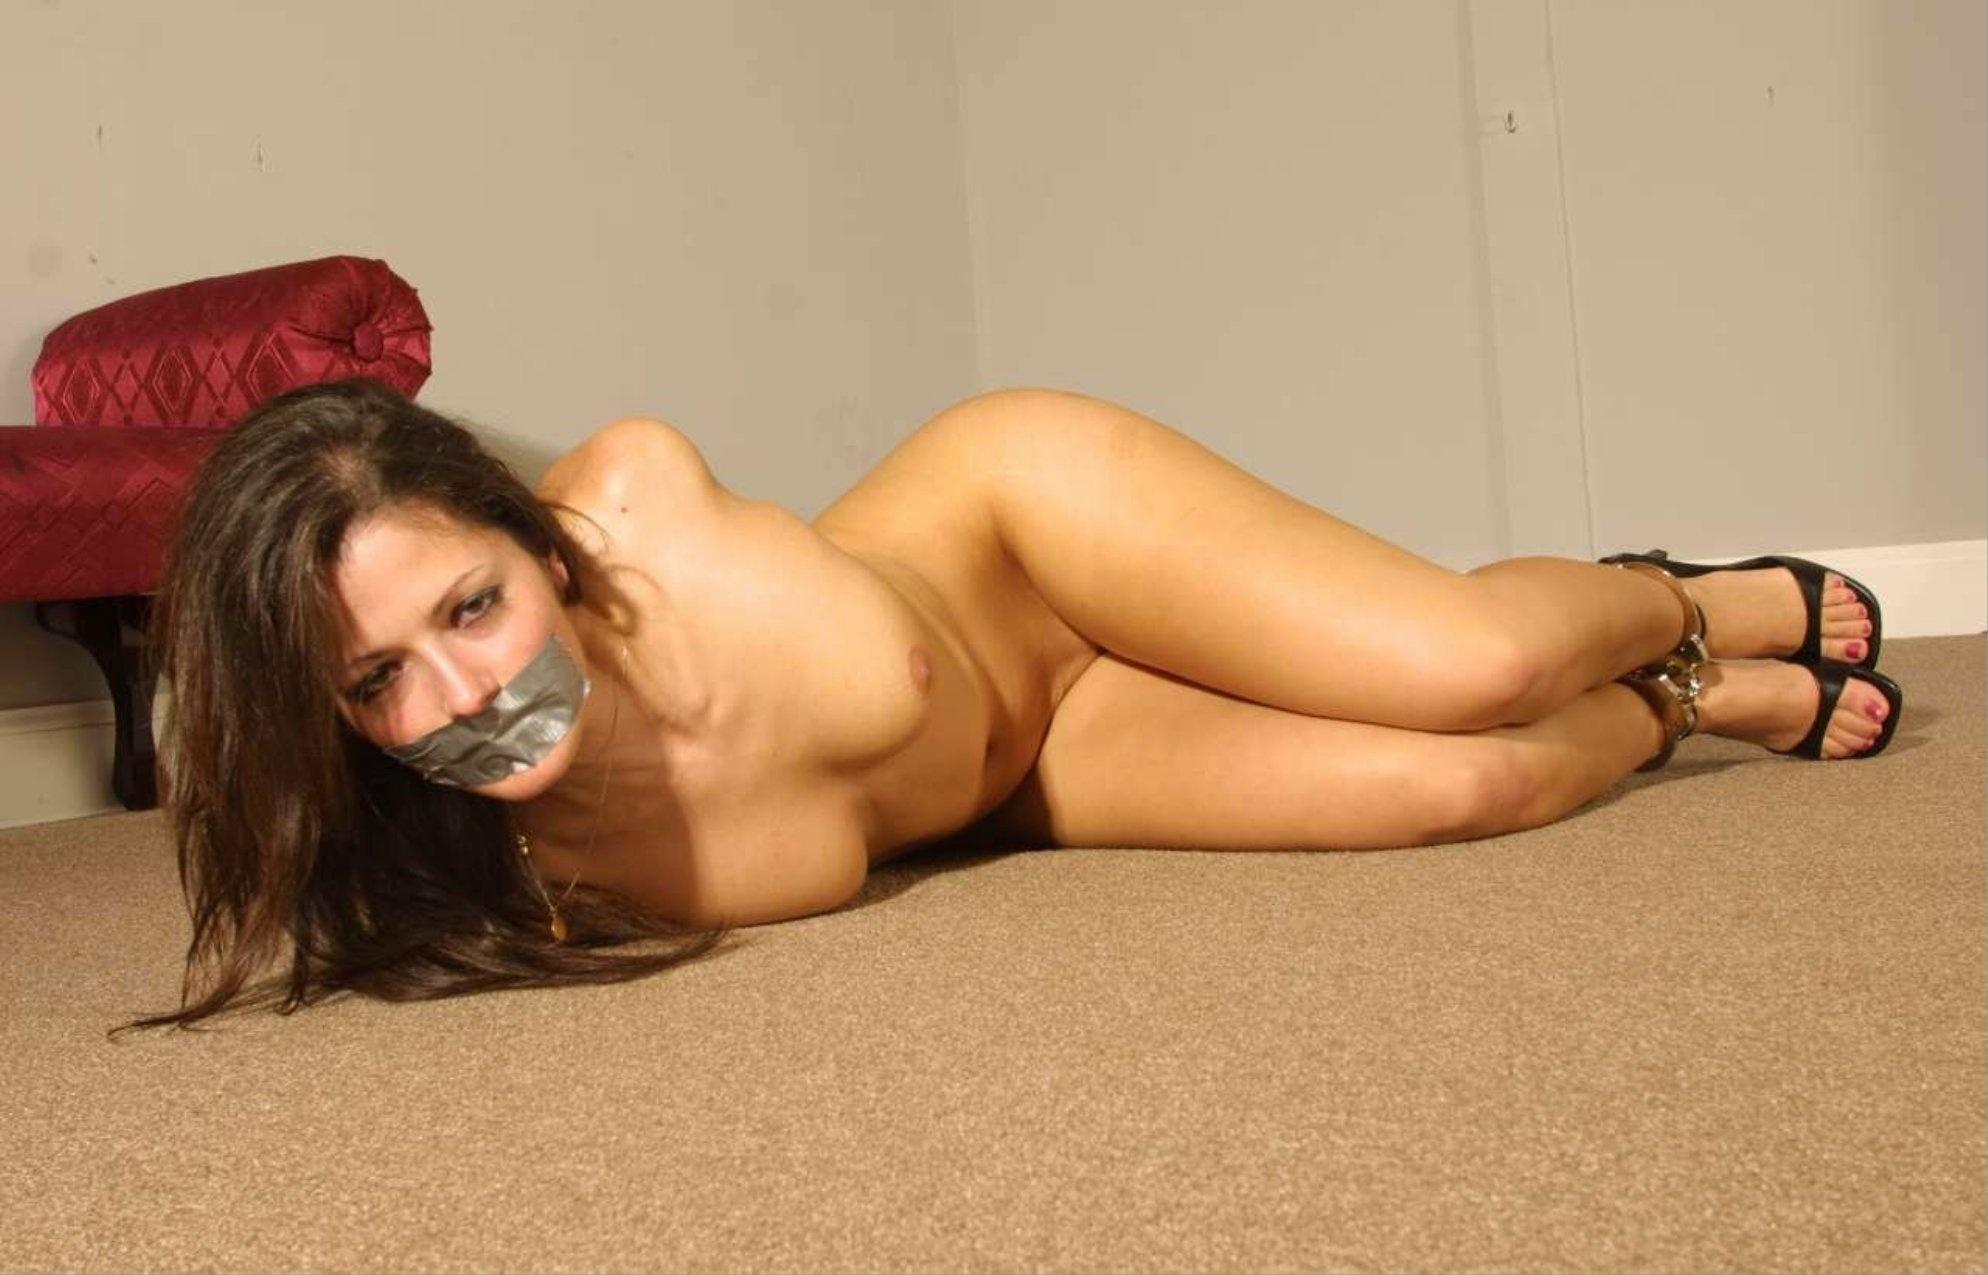 submissive pics